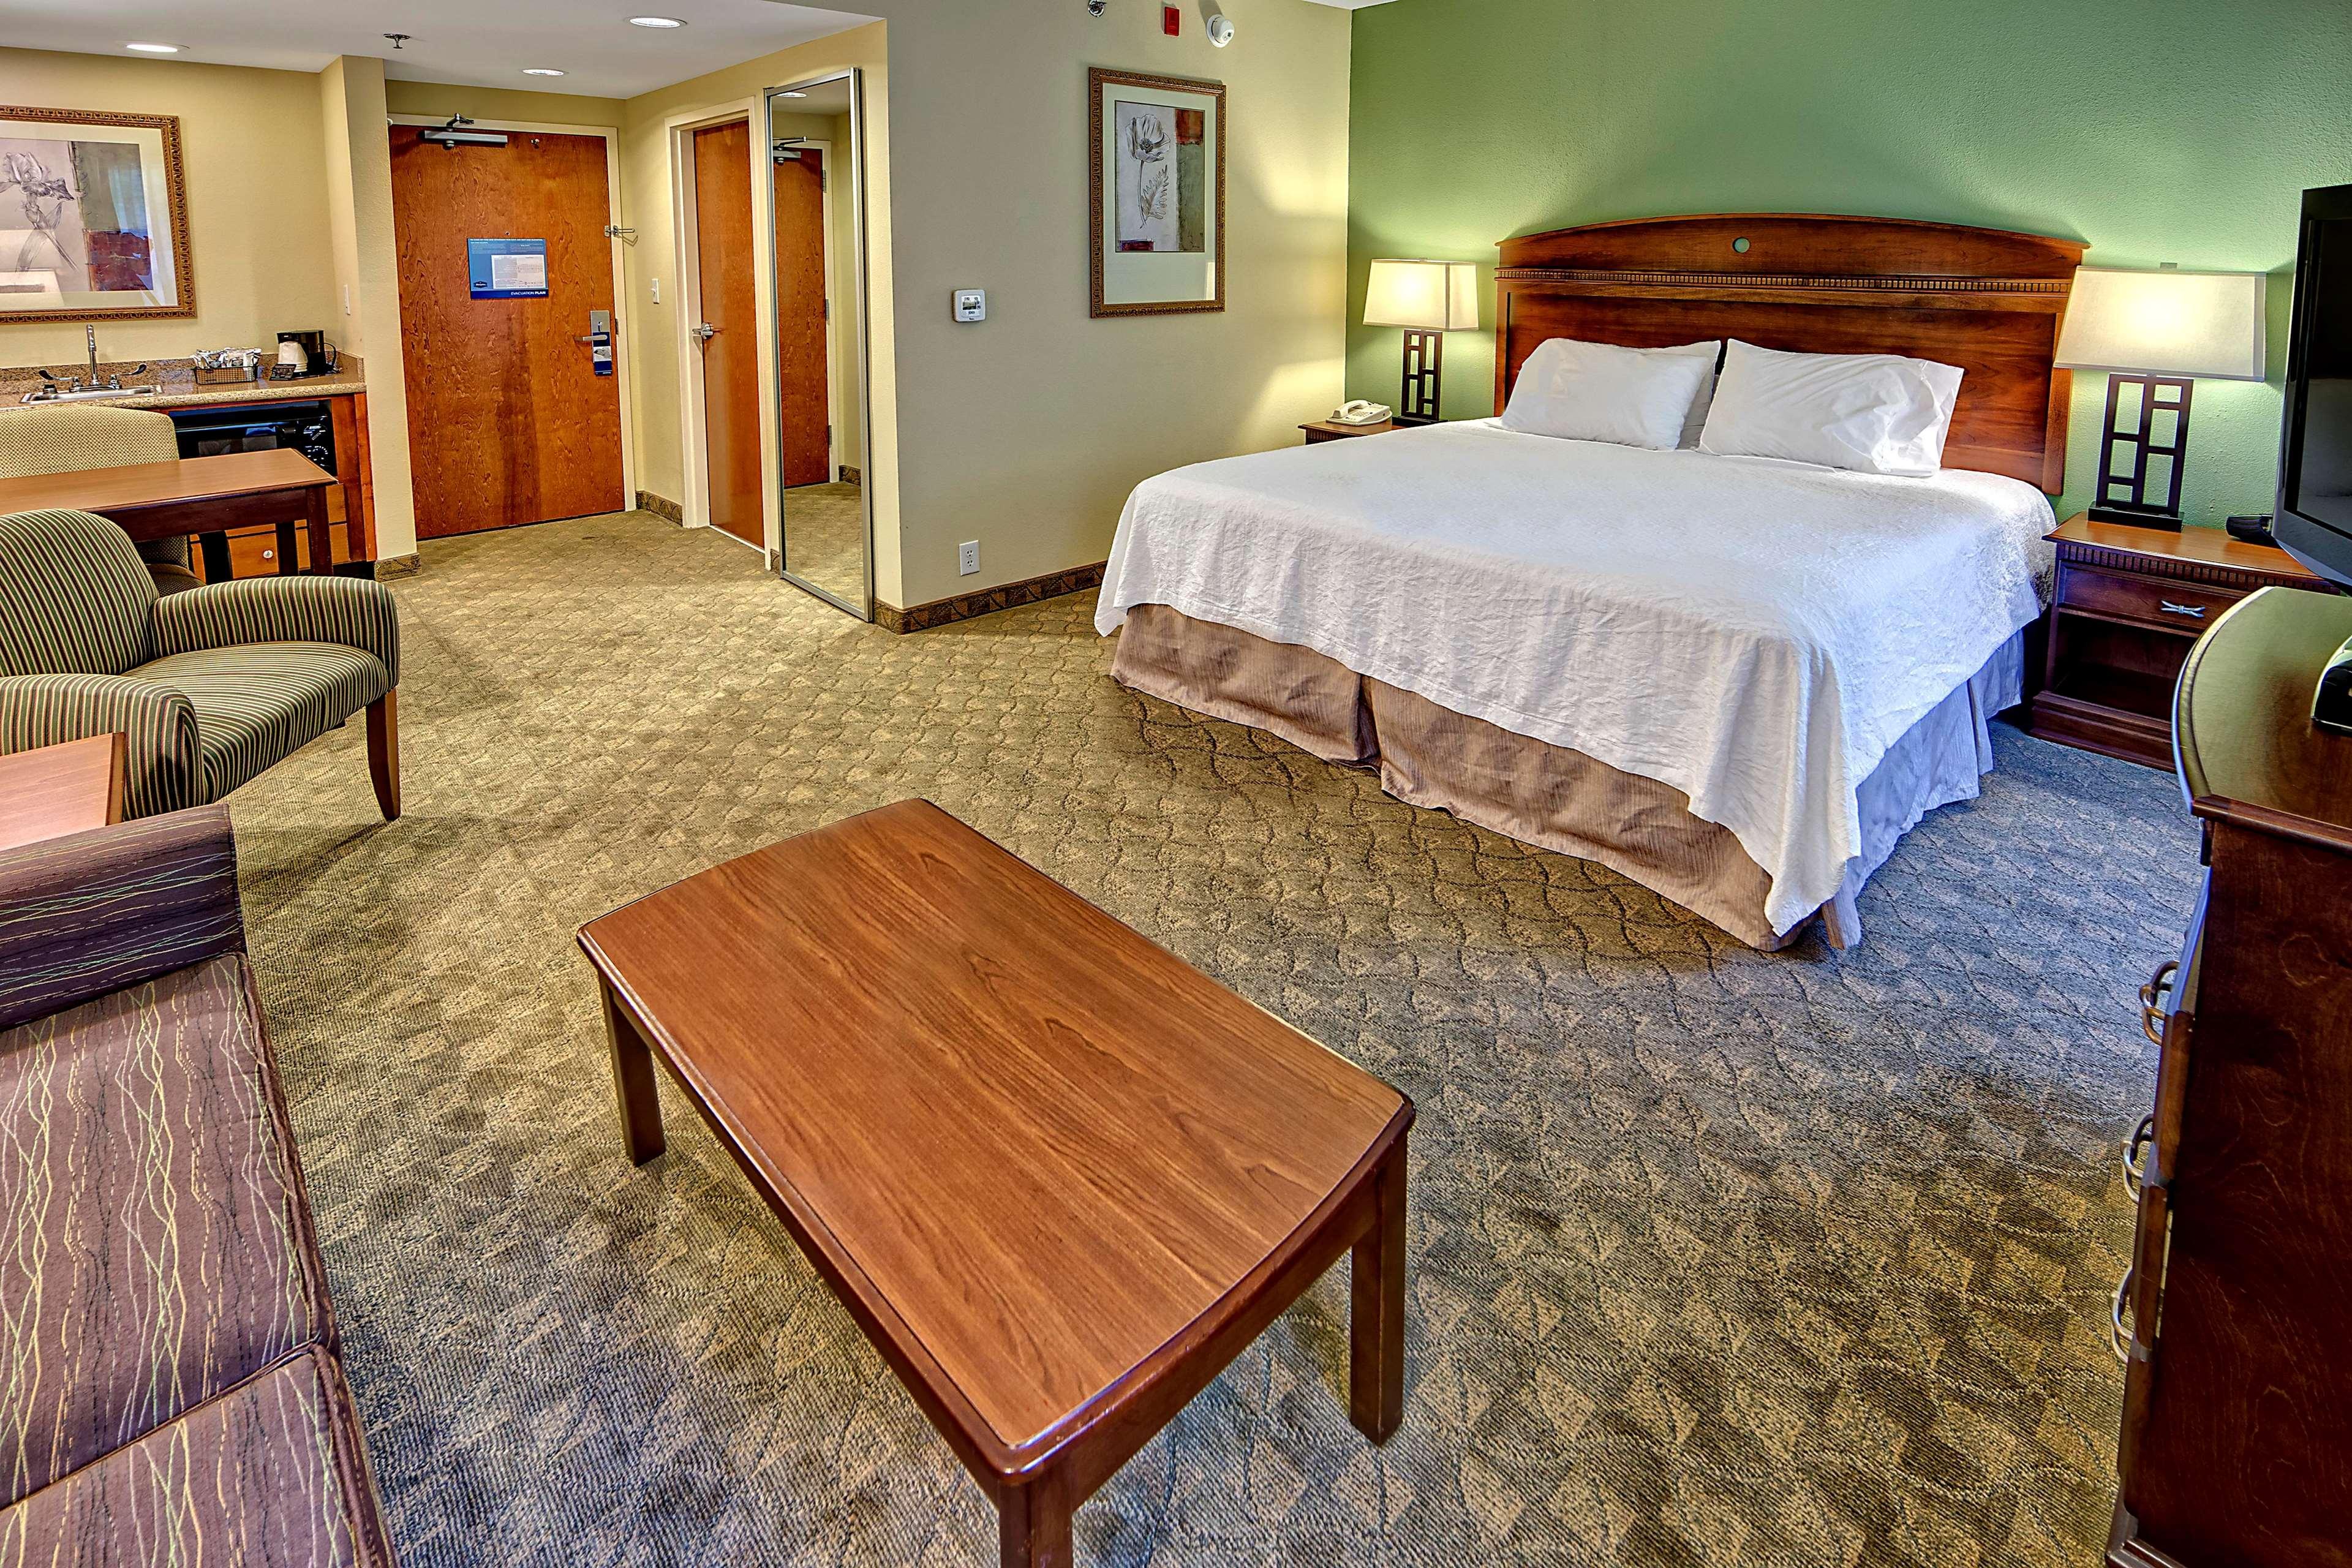 Hampton Inn & Suites Cashiers-Sapphire Valley image 40